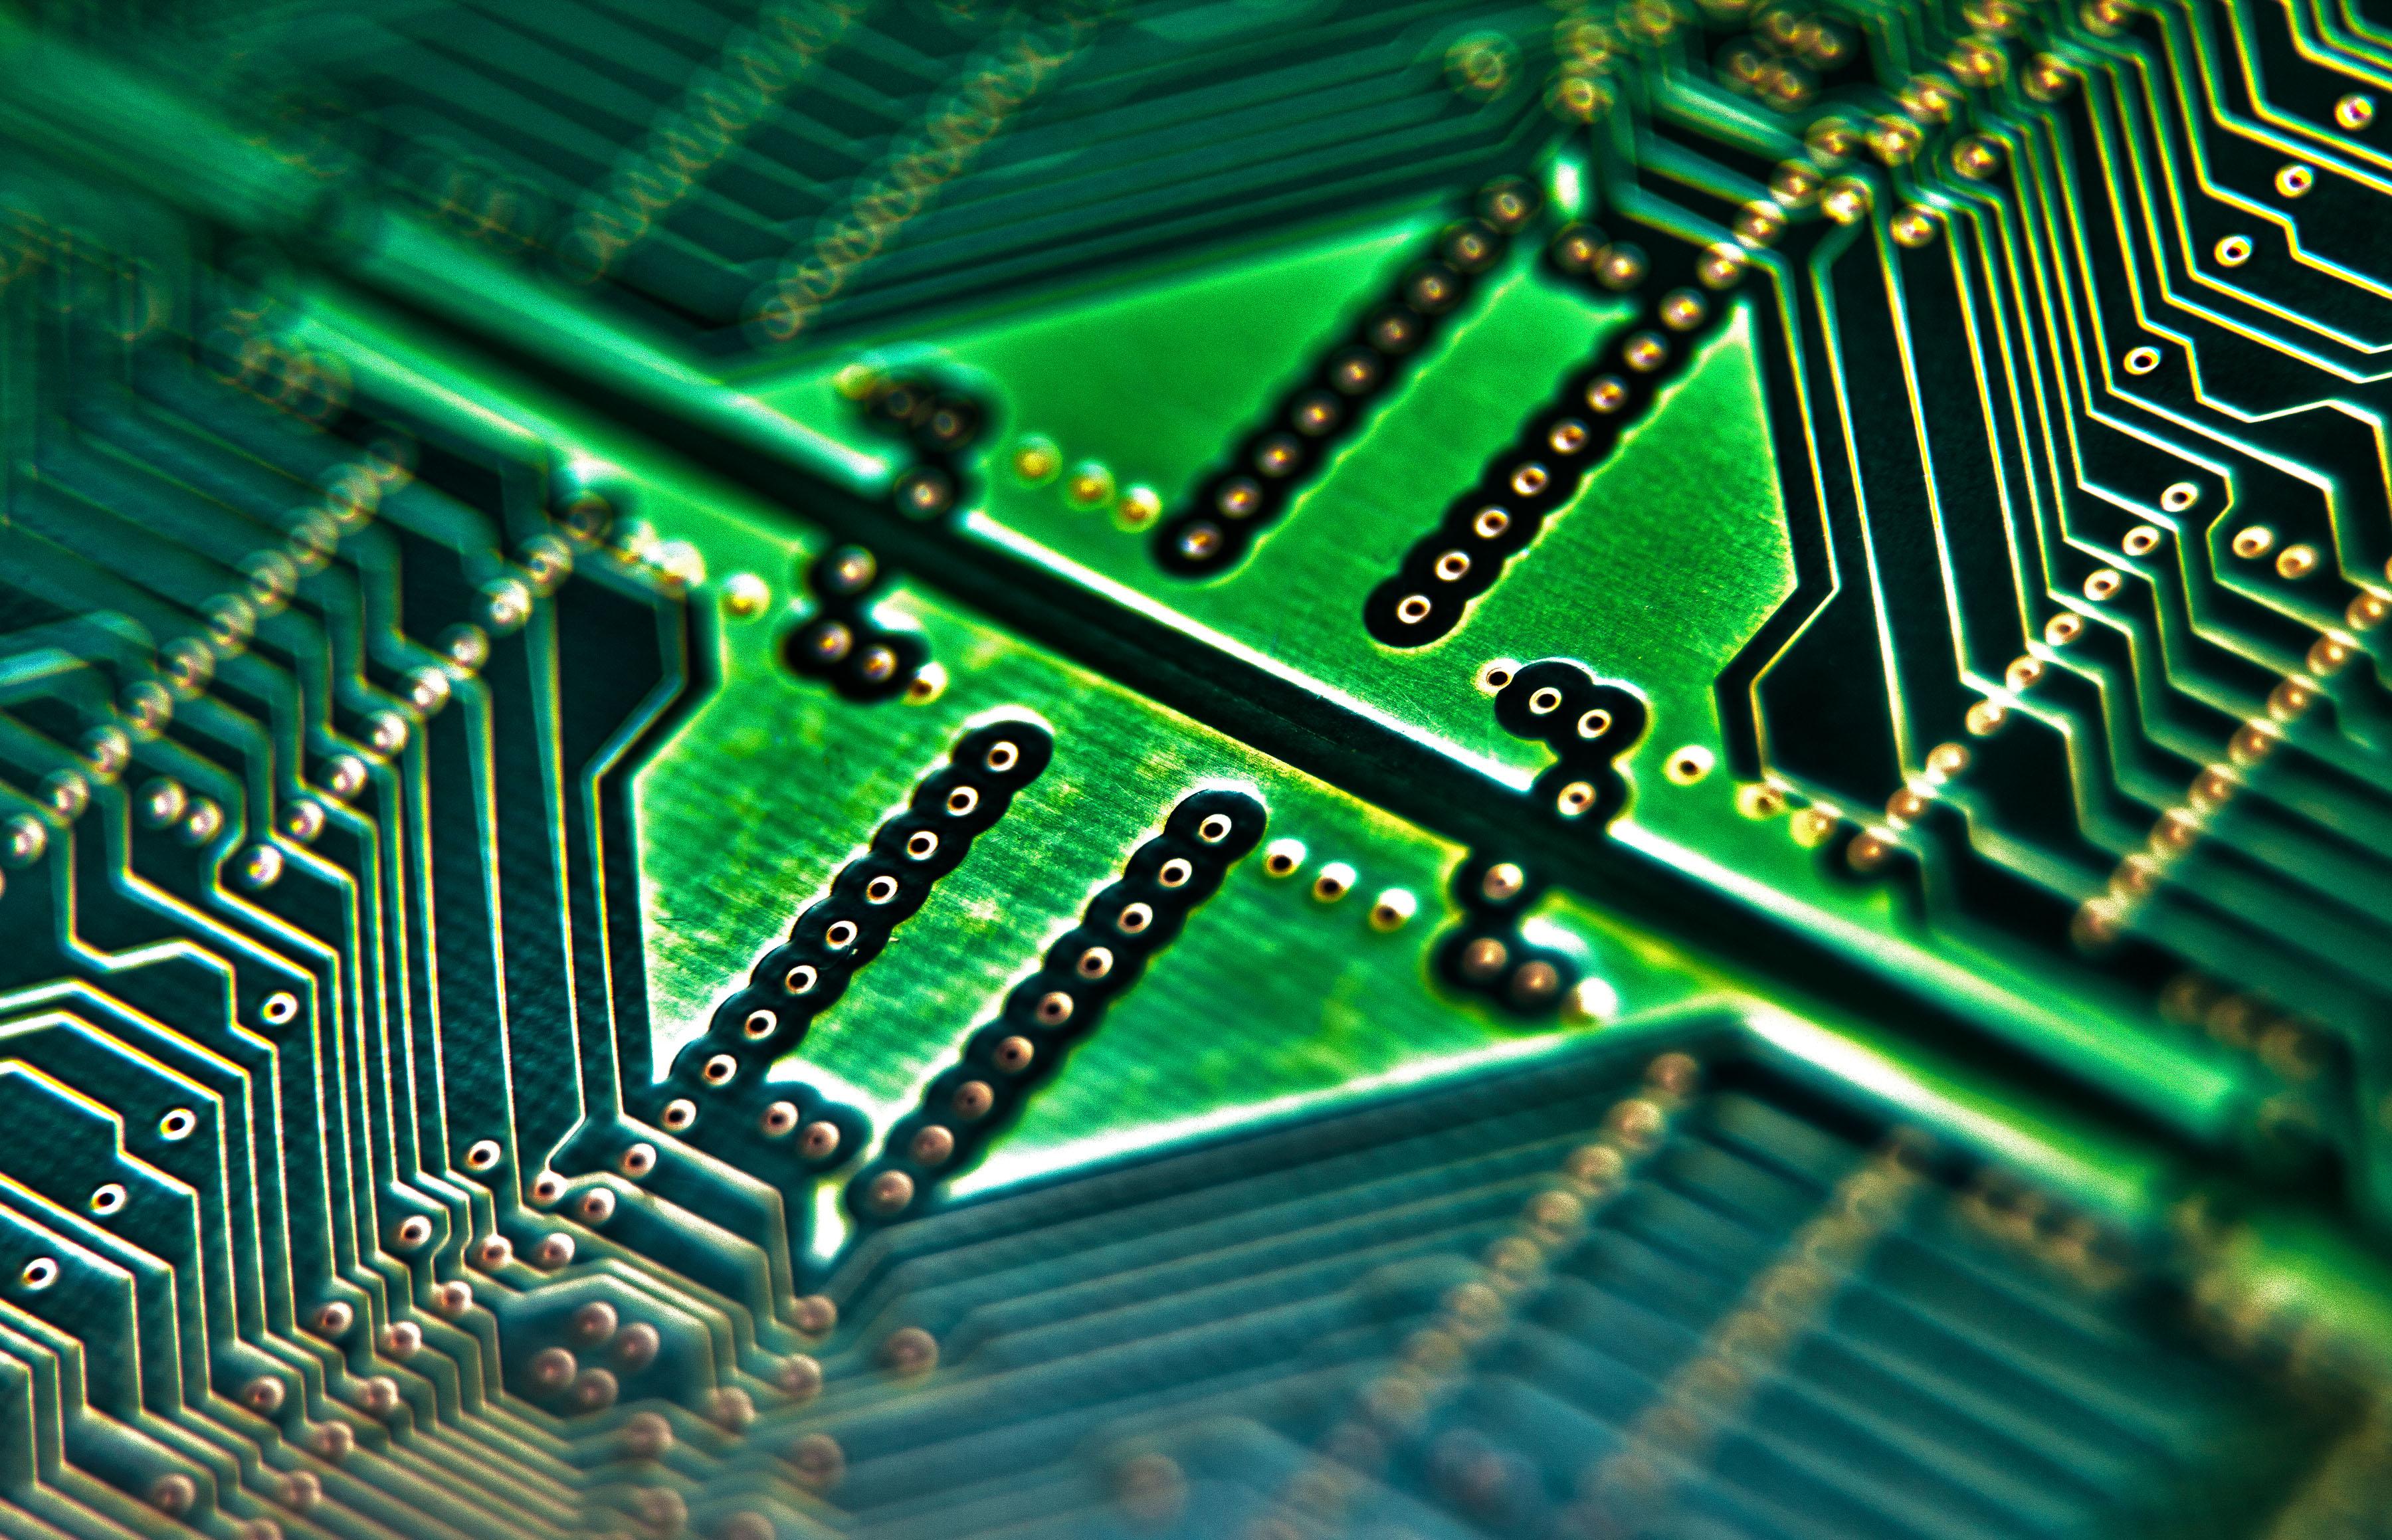 File:Computer Circuit Board MOD 45153621.jpg - Wikimedia Commons